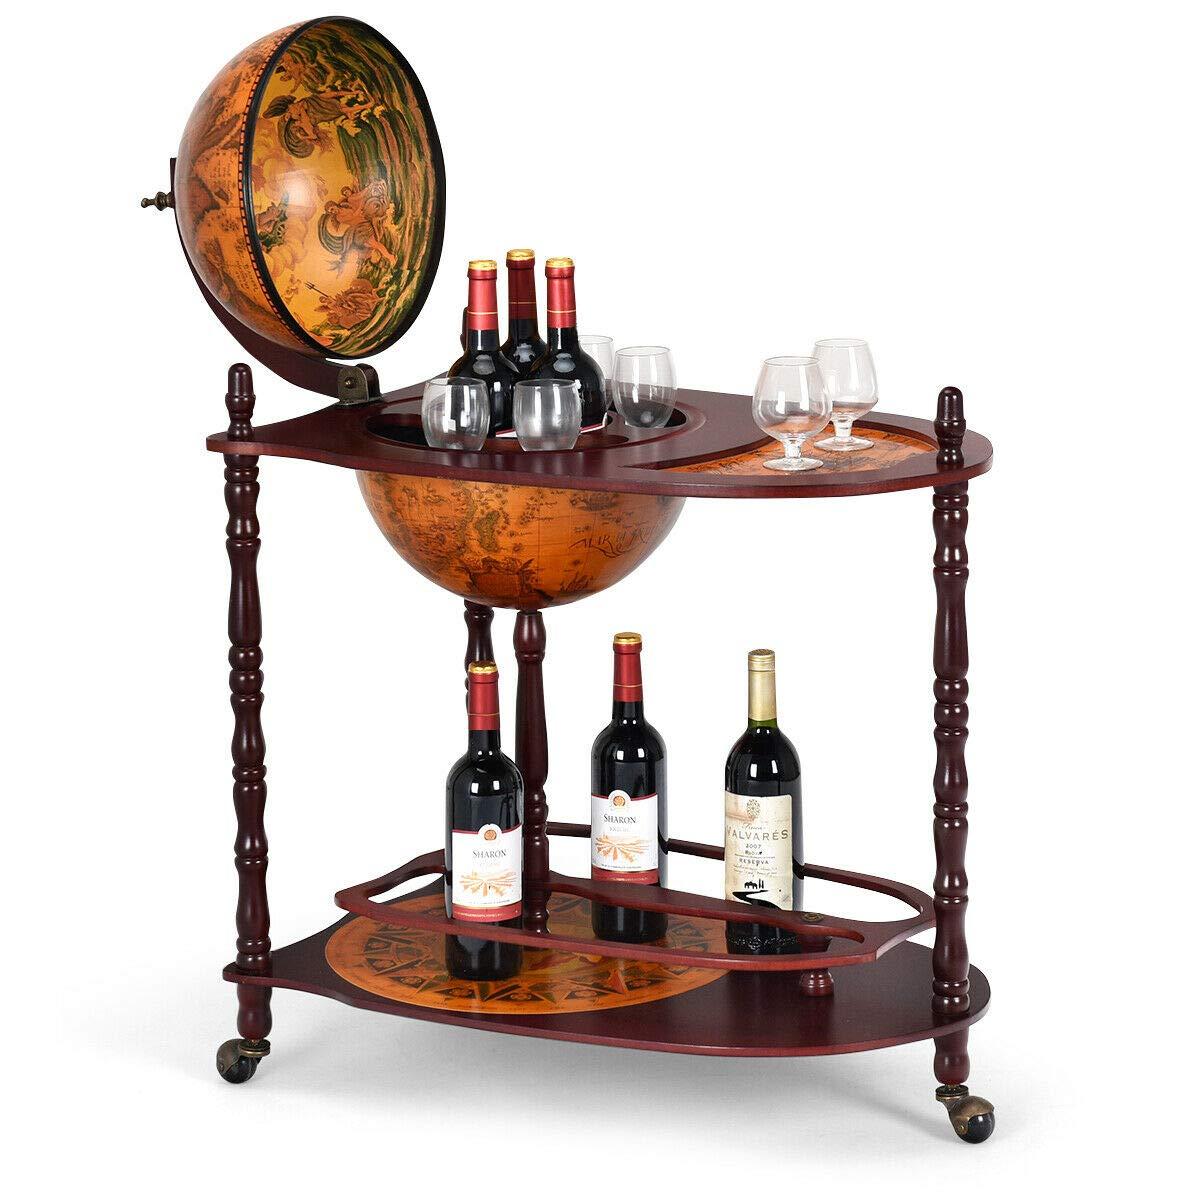 Goplus 34'' Wood Globe Wine Bar Stand 16th Century Italian Rack Bigger Shelf for More Liquor Bottle by Goplus